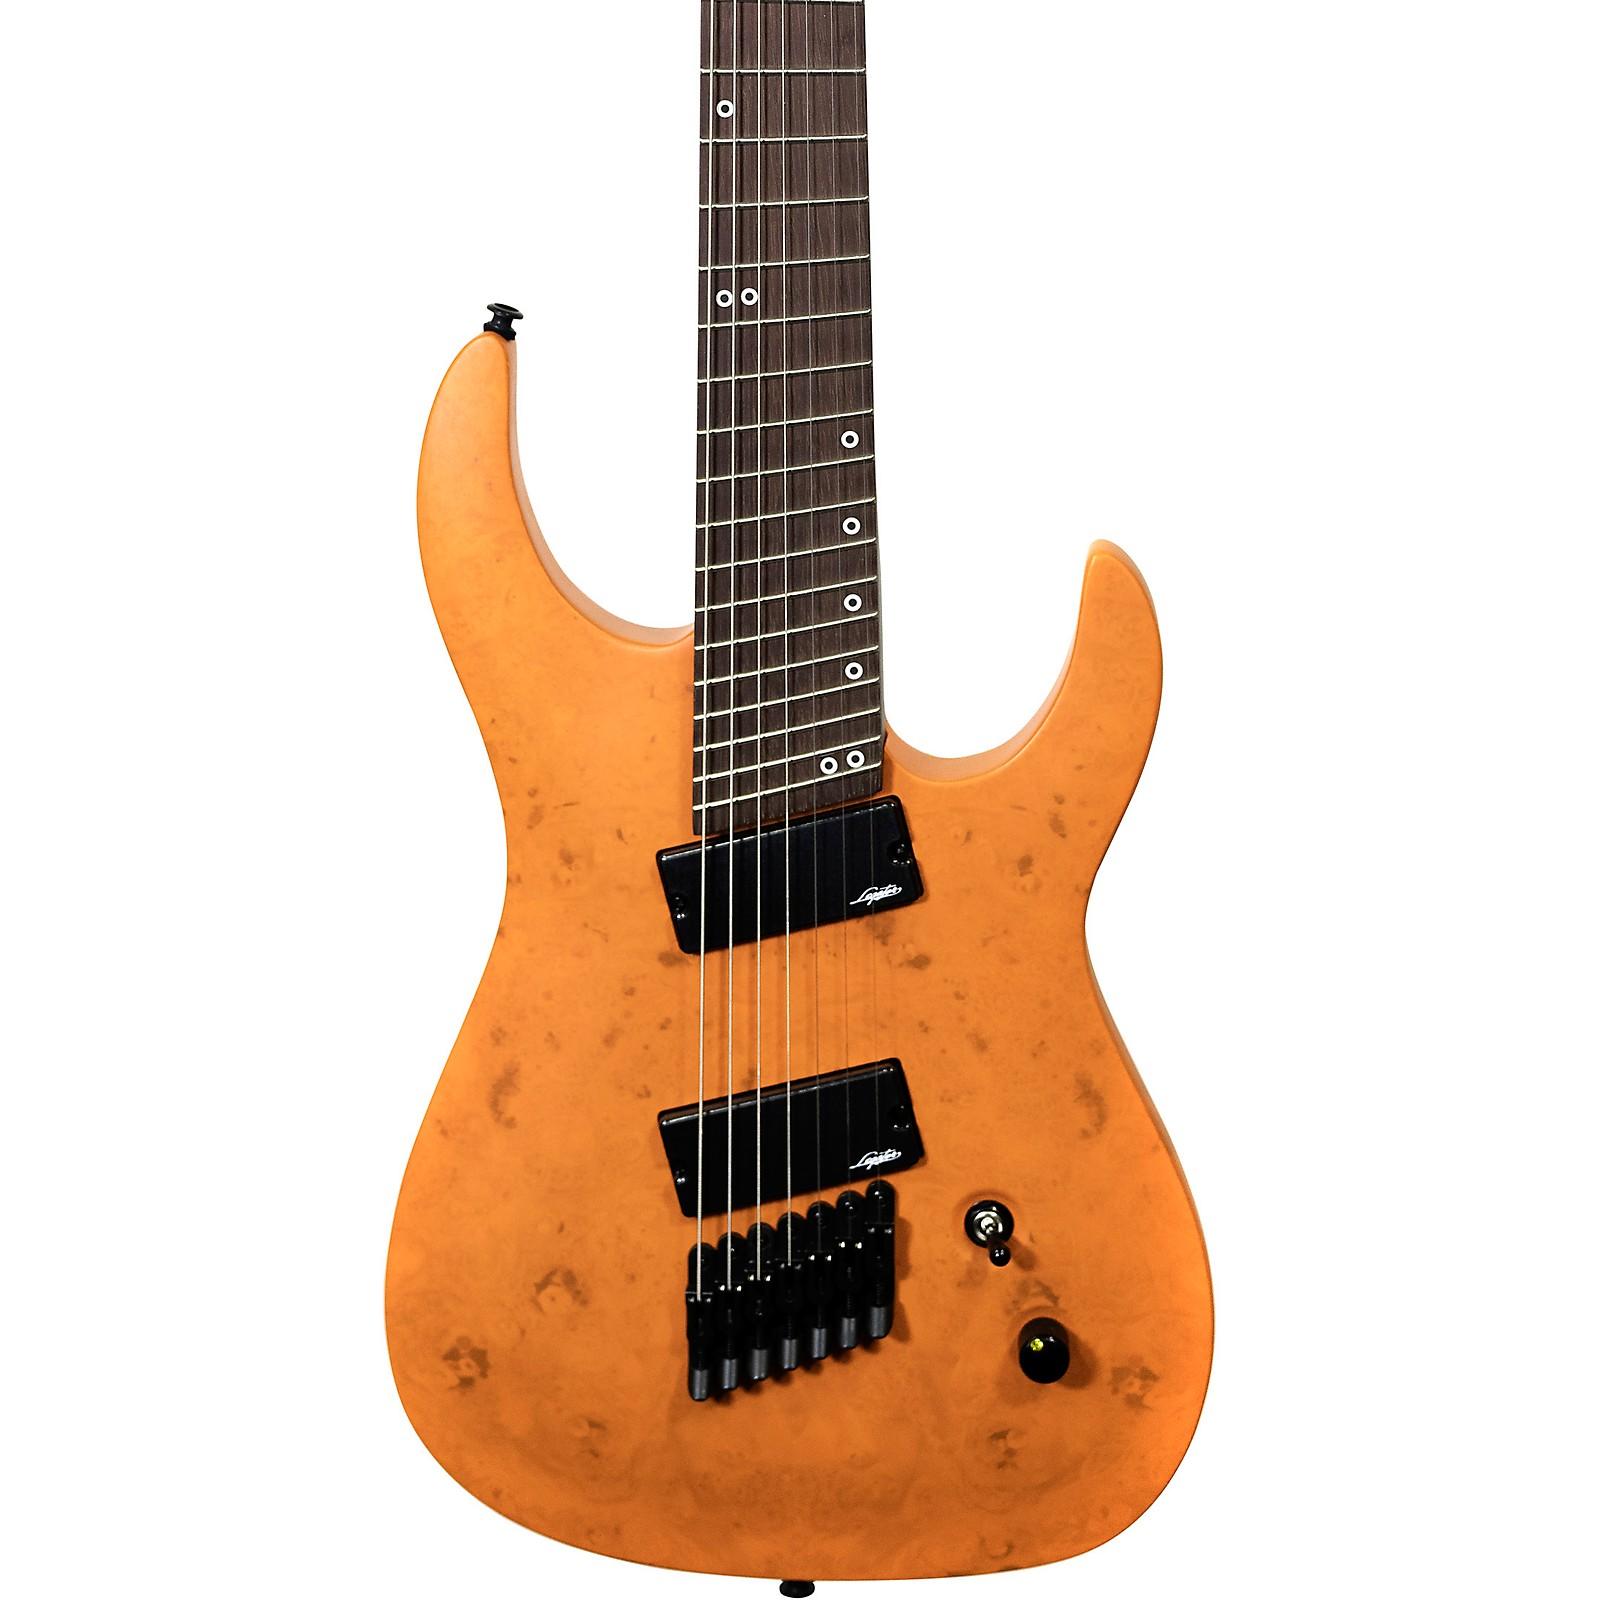 Open Box Legator Ninja Performance 7 Multi-Scale Purpleheart Electric Guitar